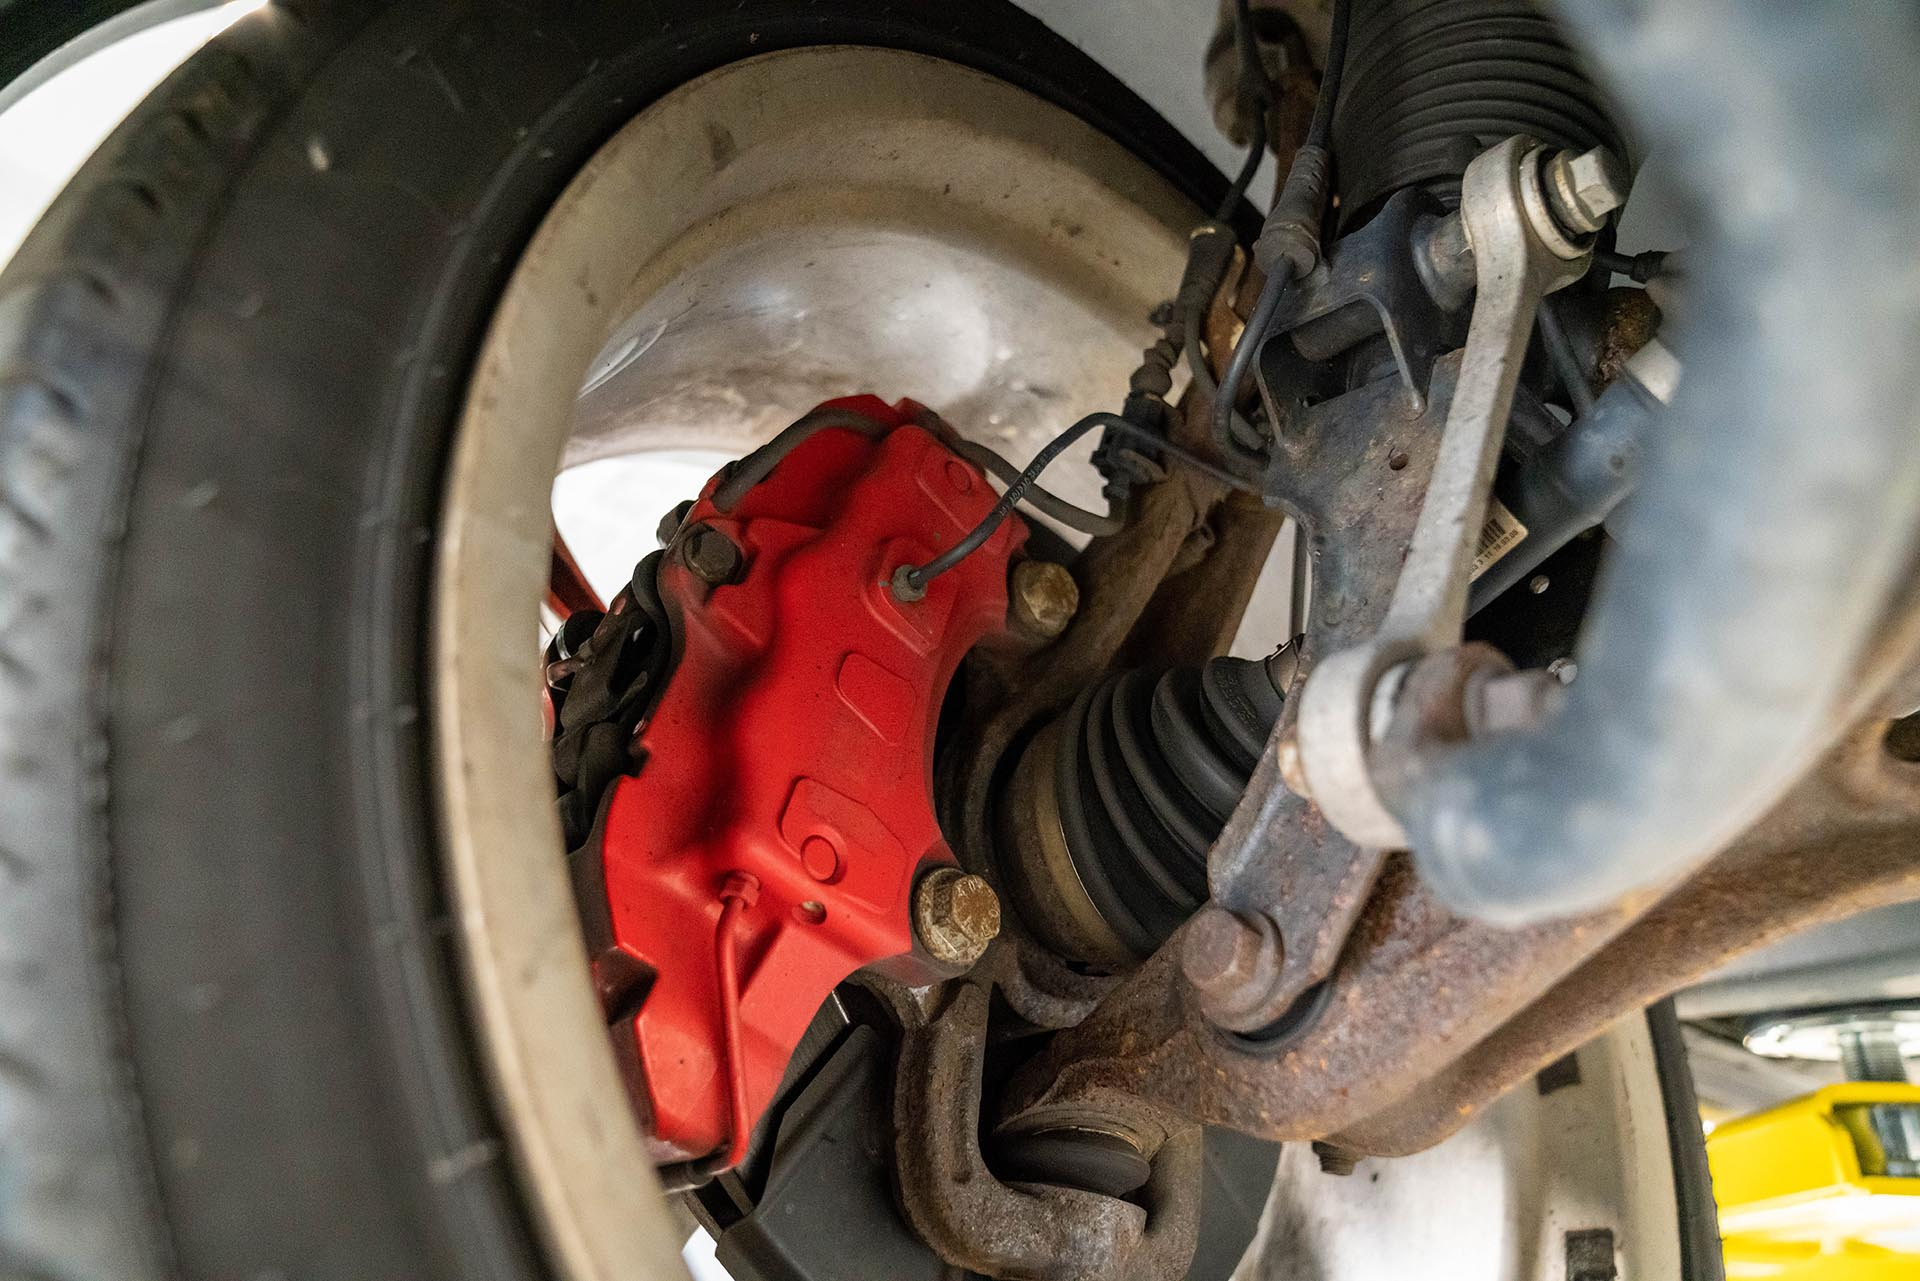 05_Porsche 957 Cayenne ABS sensor brakes inside